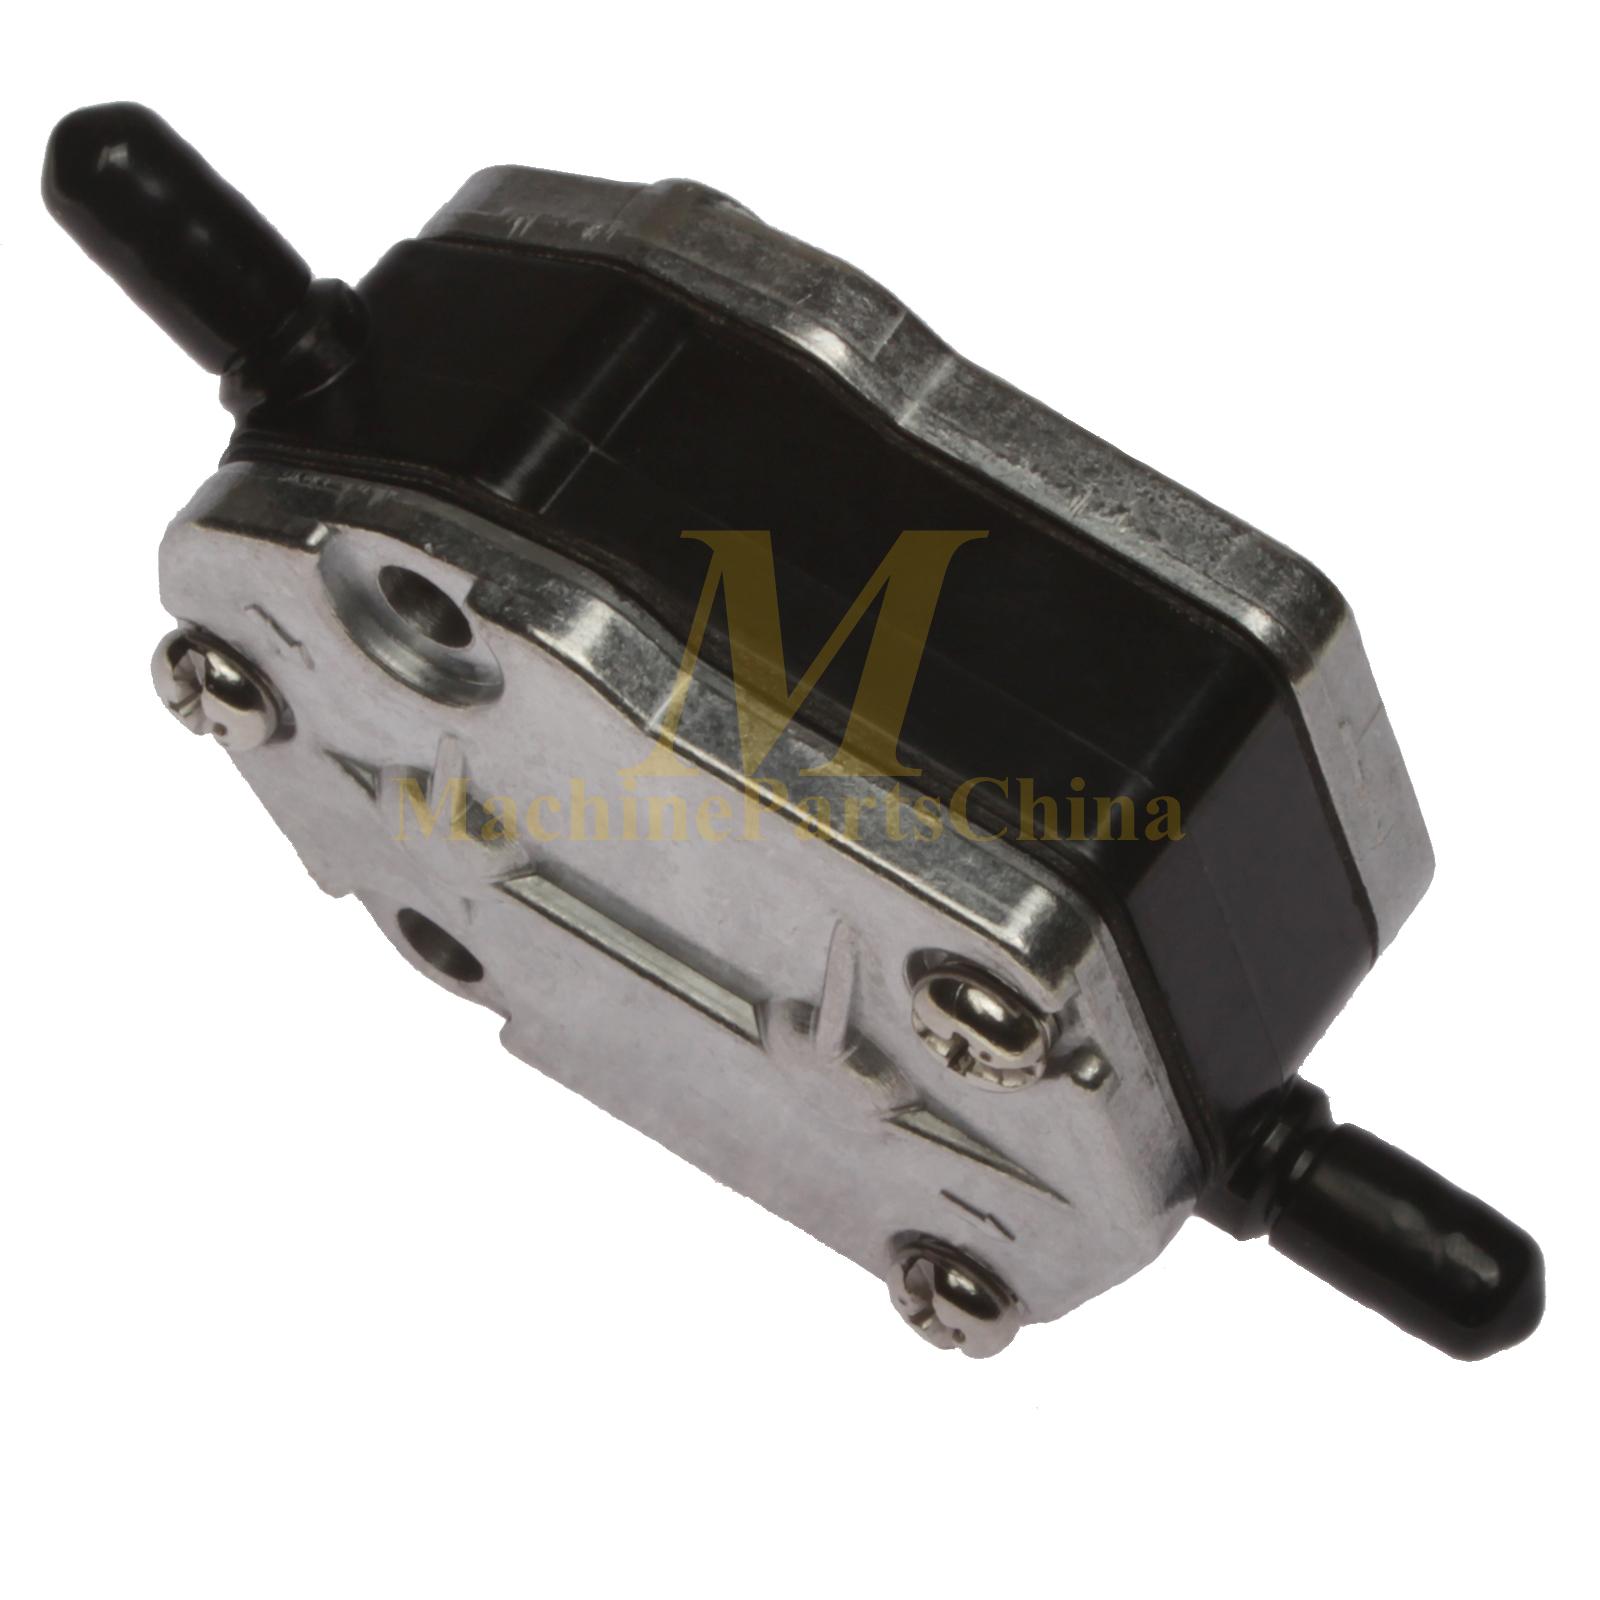 SUZUKI FUEL PUMP AND GASKET DT9.9 DT20 DT25 DT30 DT35 DT40 DT50 DT55 DT60 DT65